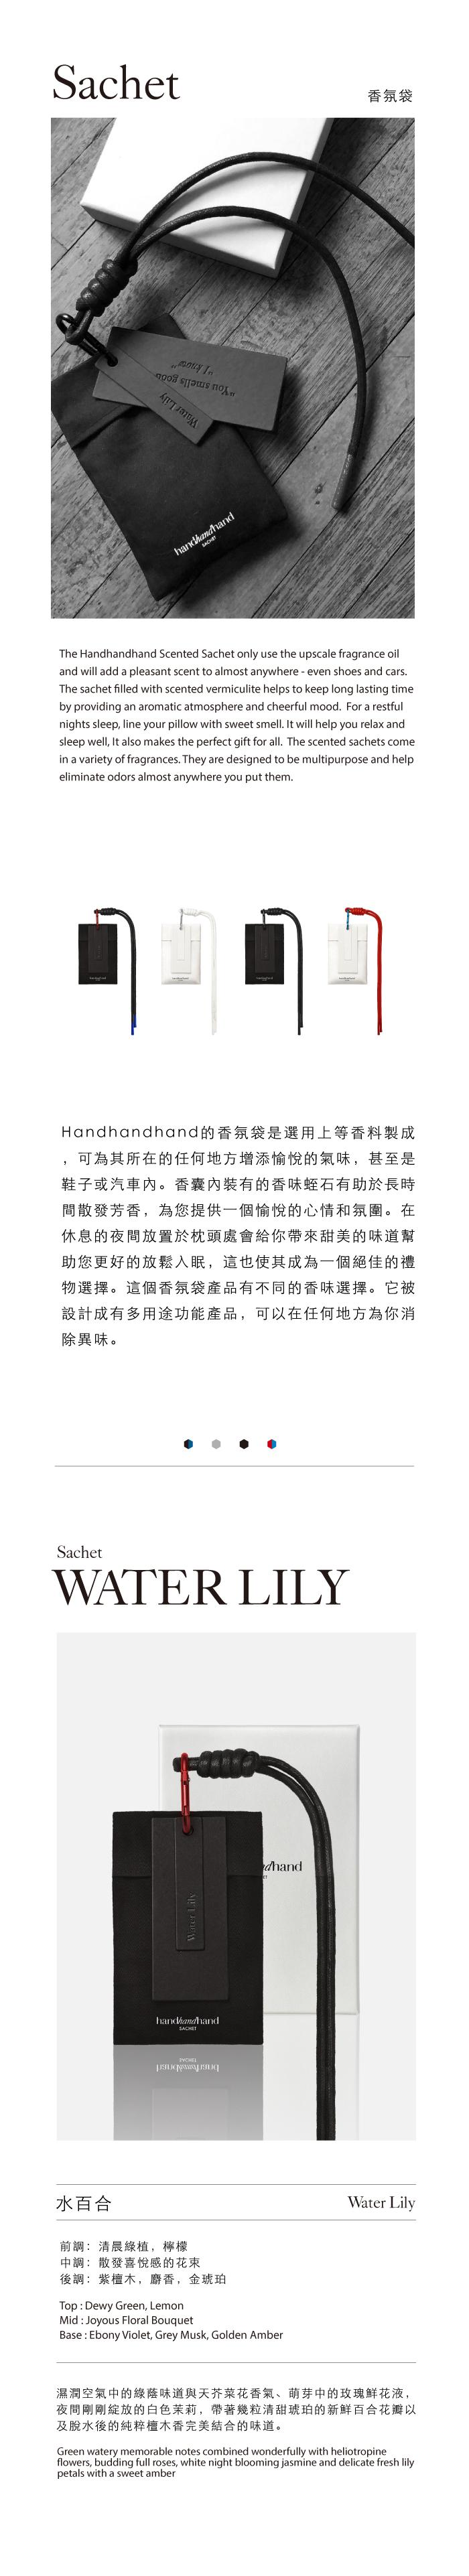 handhandhand|HHH香氛袋 (水百合)